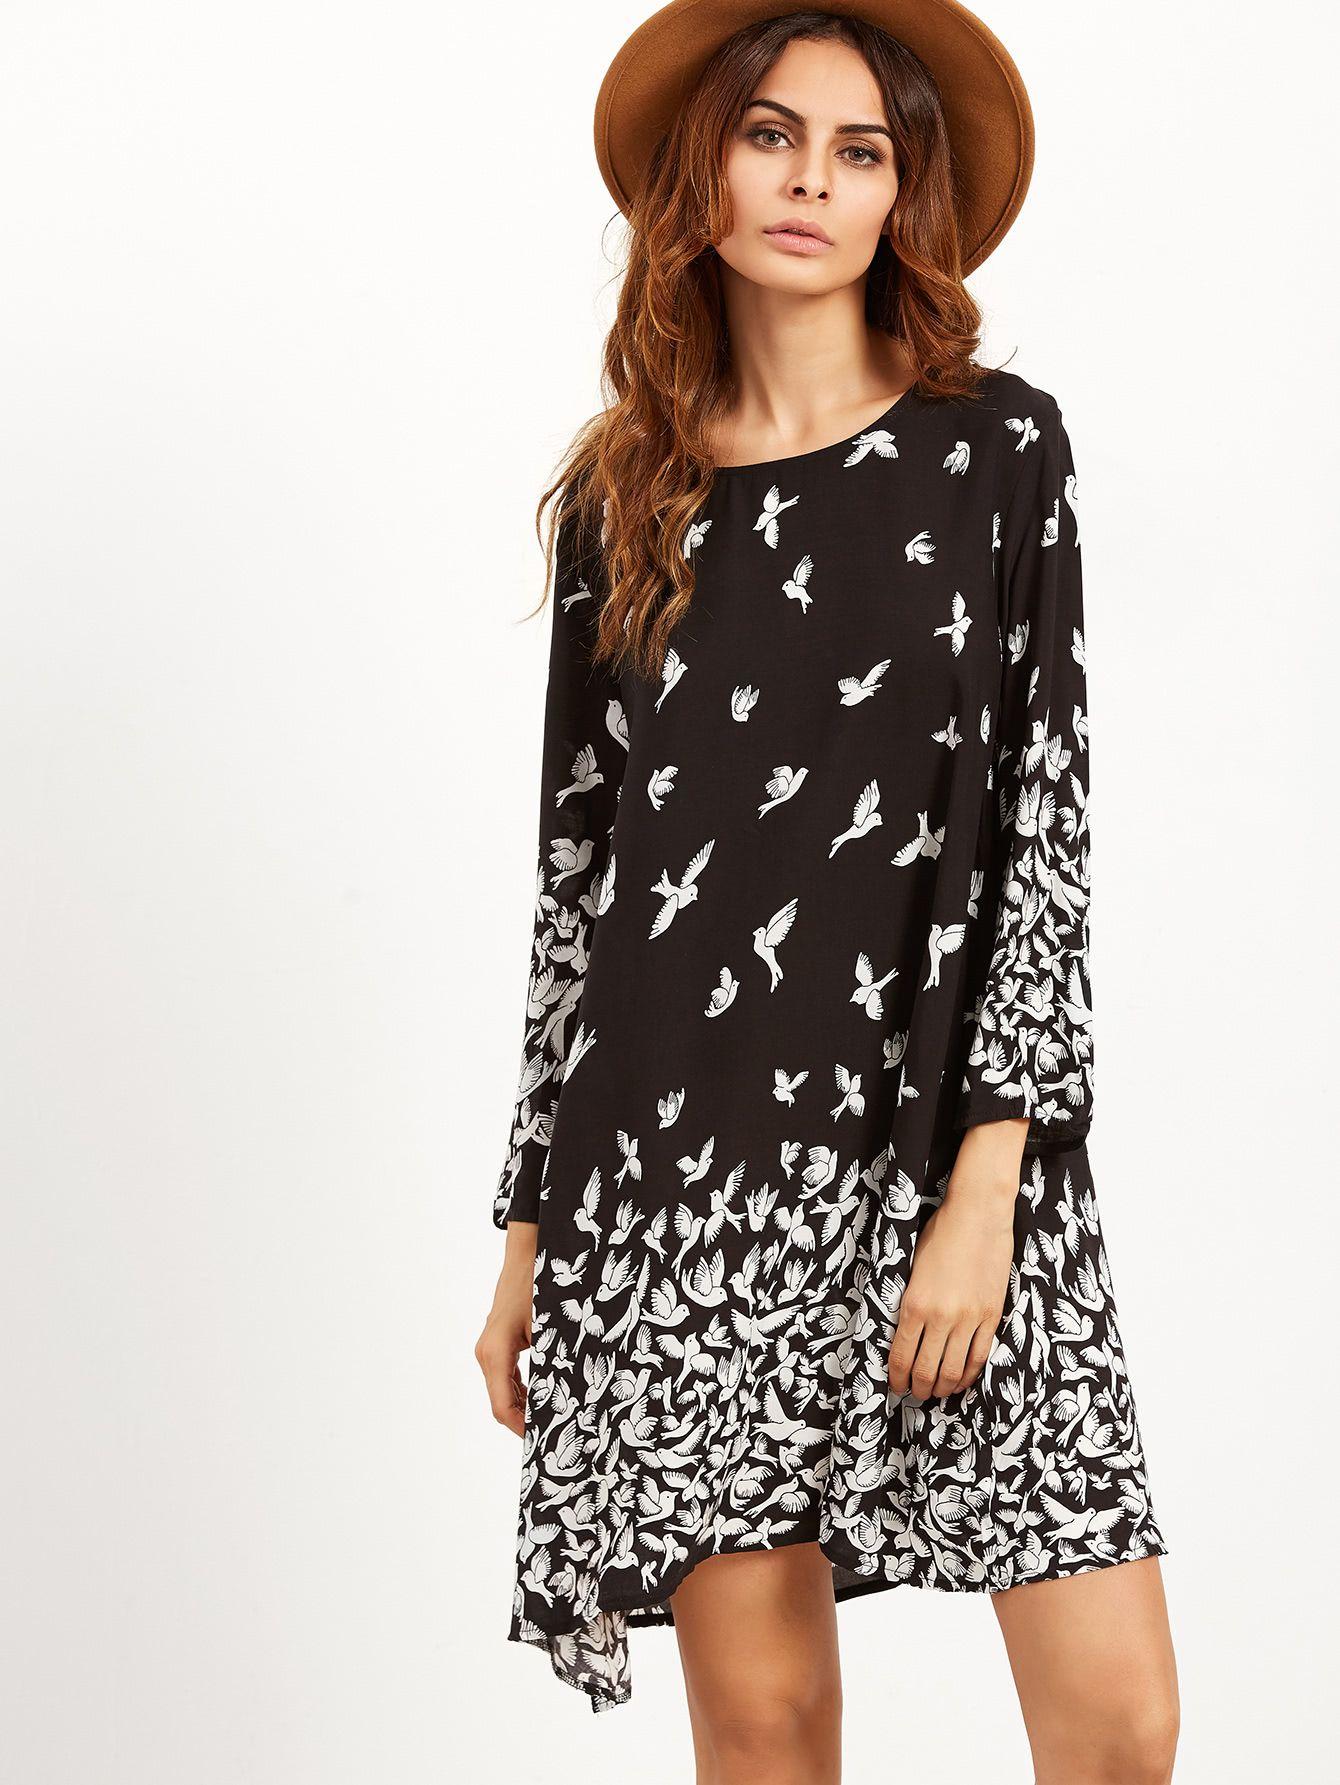 Tunika Kleid mit Taube Druck - schwarz   Pinterest   Tunika kleid ...